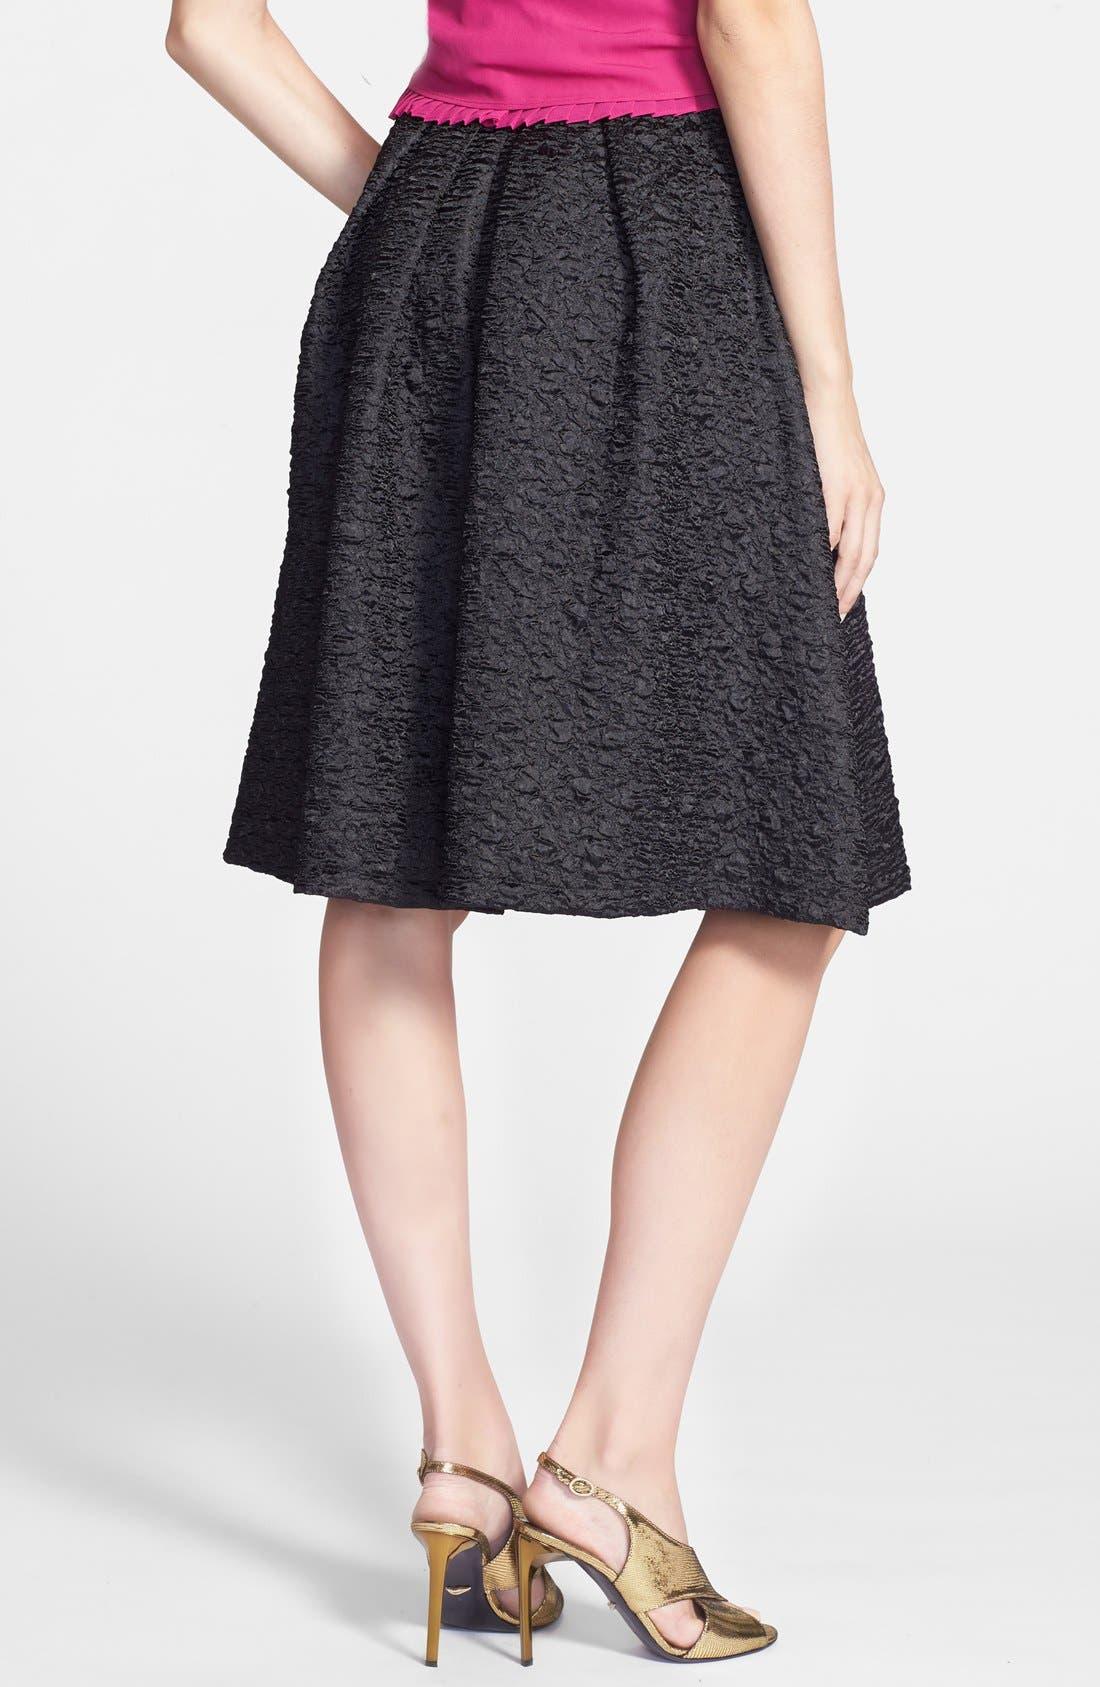 ASTR THE LABEL, ASTR Textured Pleat Skirt, Alternate thumbnail 2, color, 001